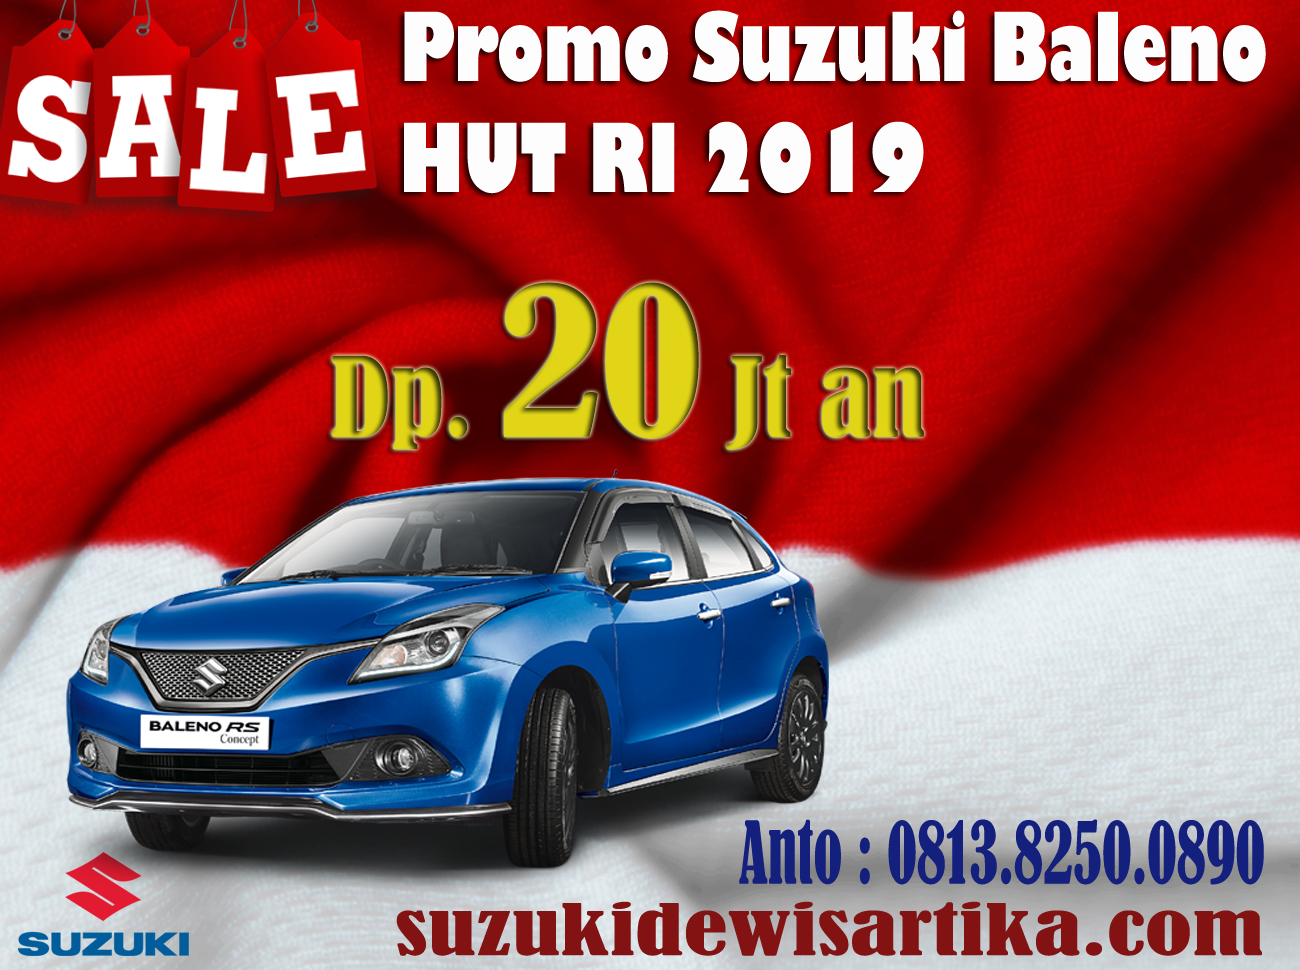 PROMO SUZUKI BALENO BULAN AGUSTUS 2019